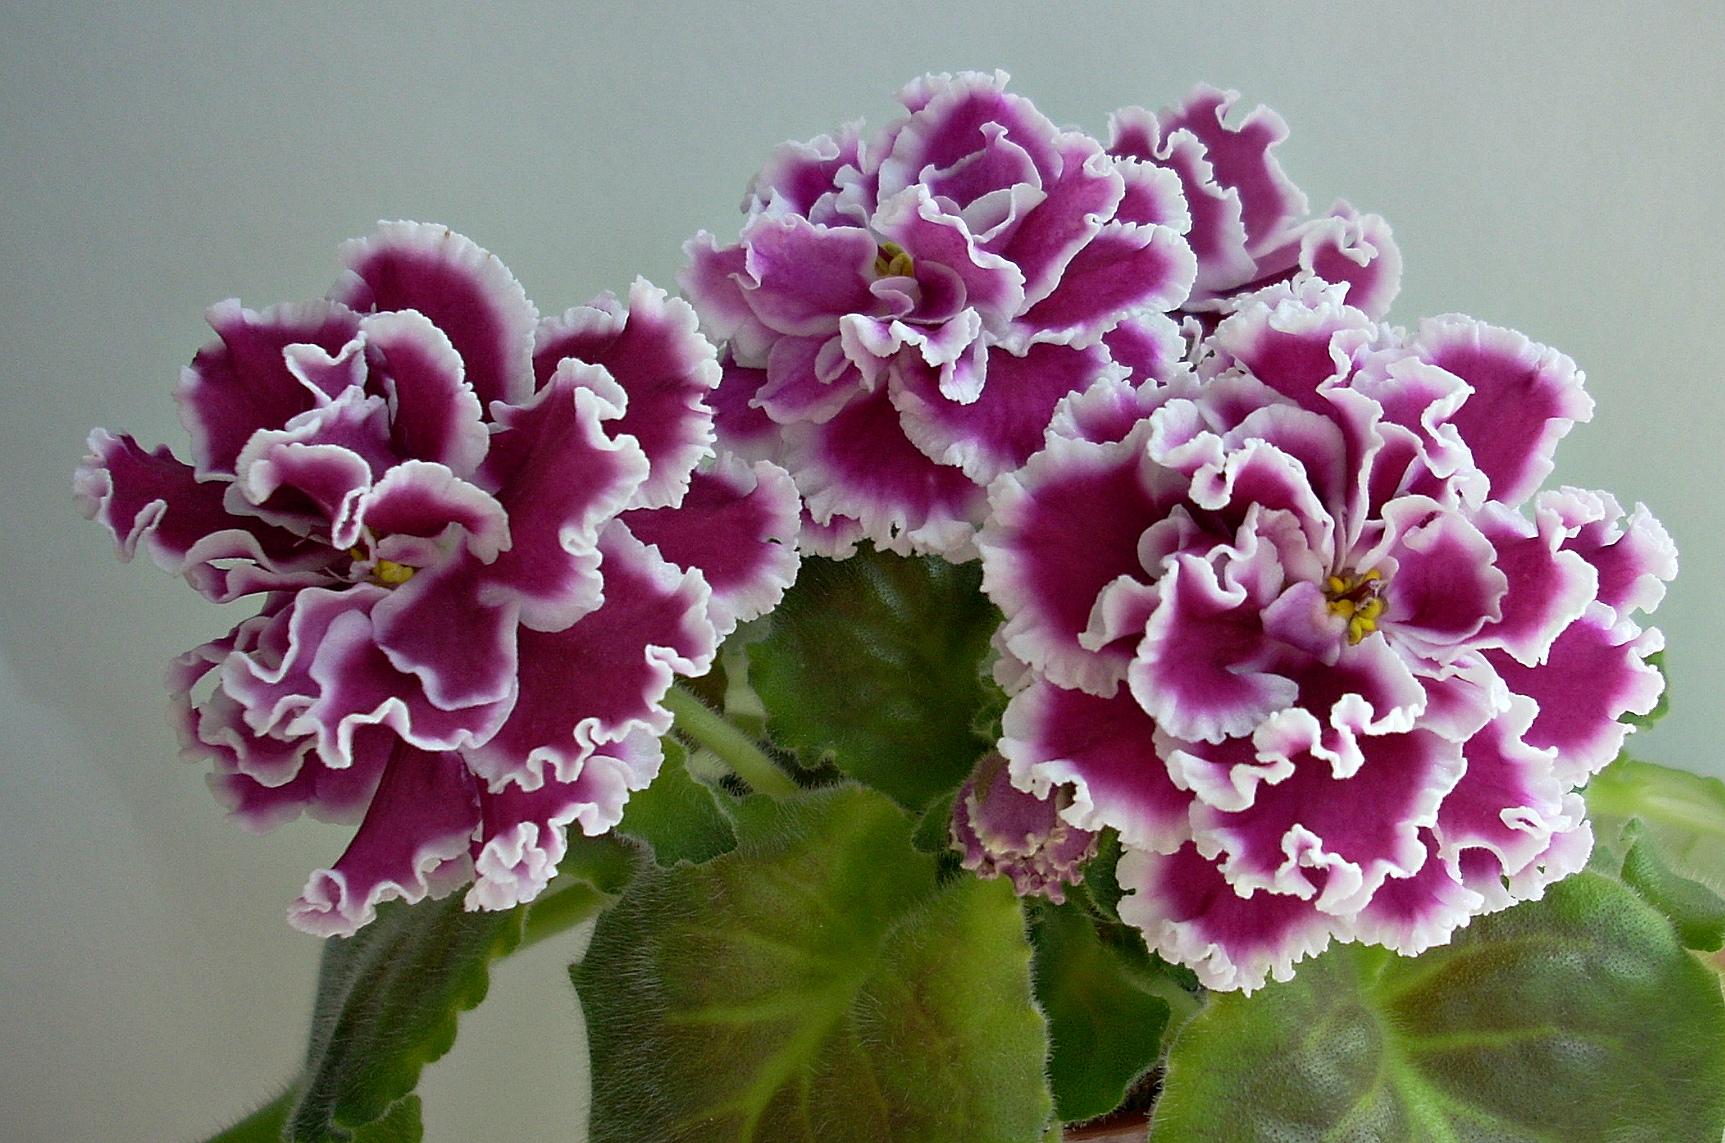 Цветы фиалки разновидности